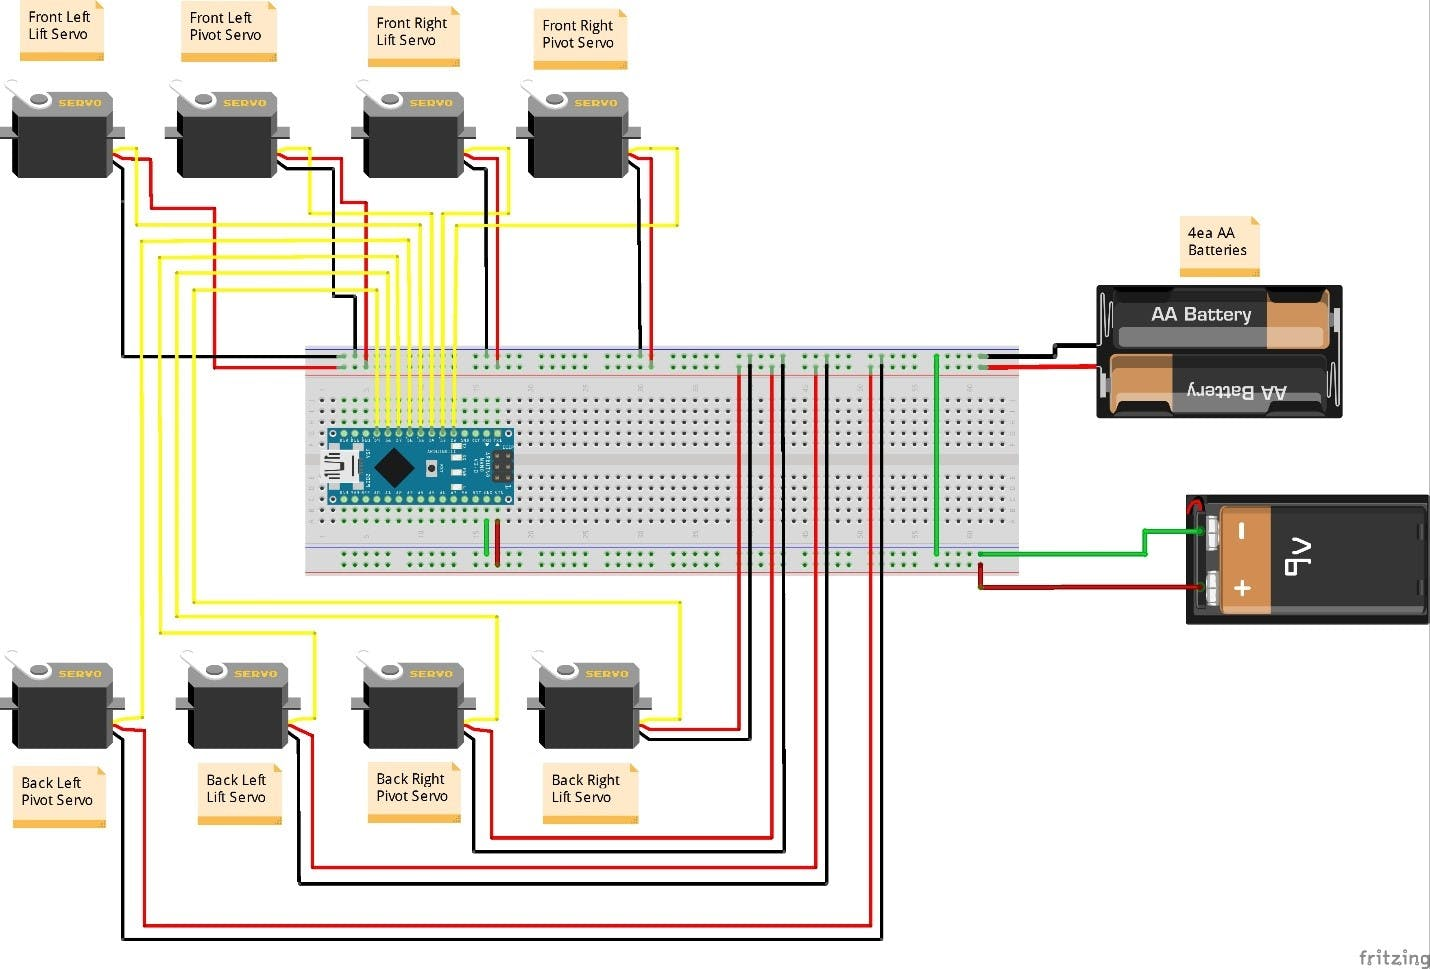 Servos use Arduino Uno instead